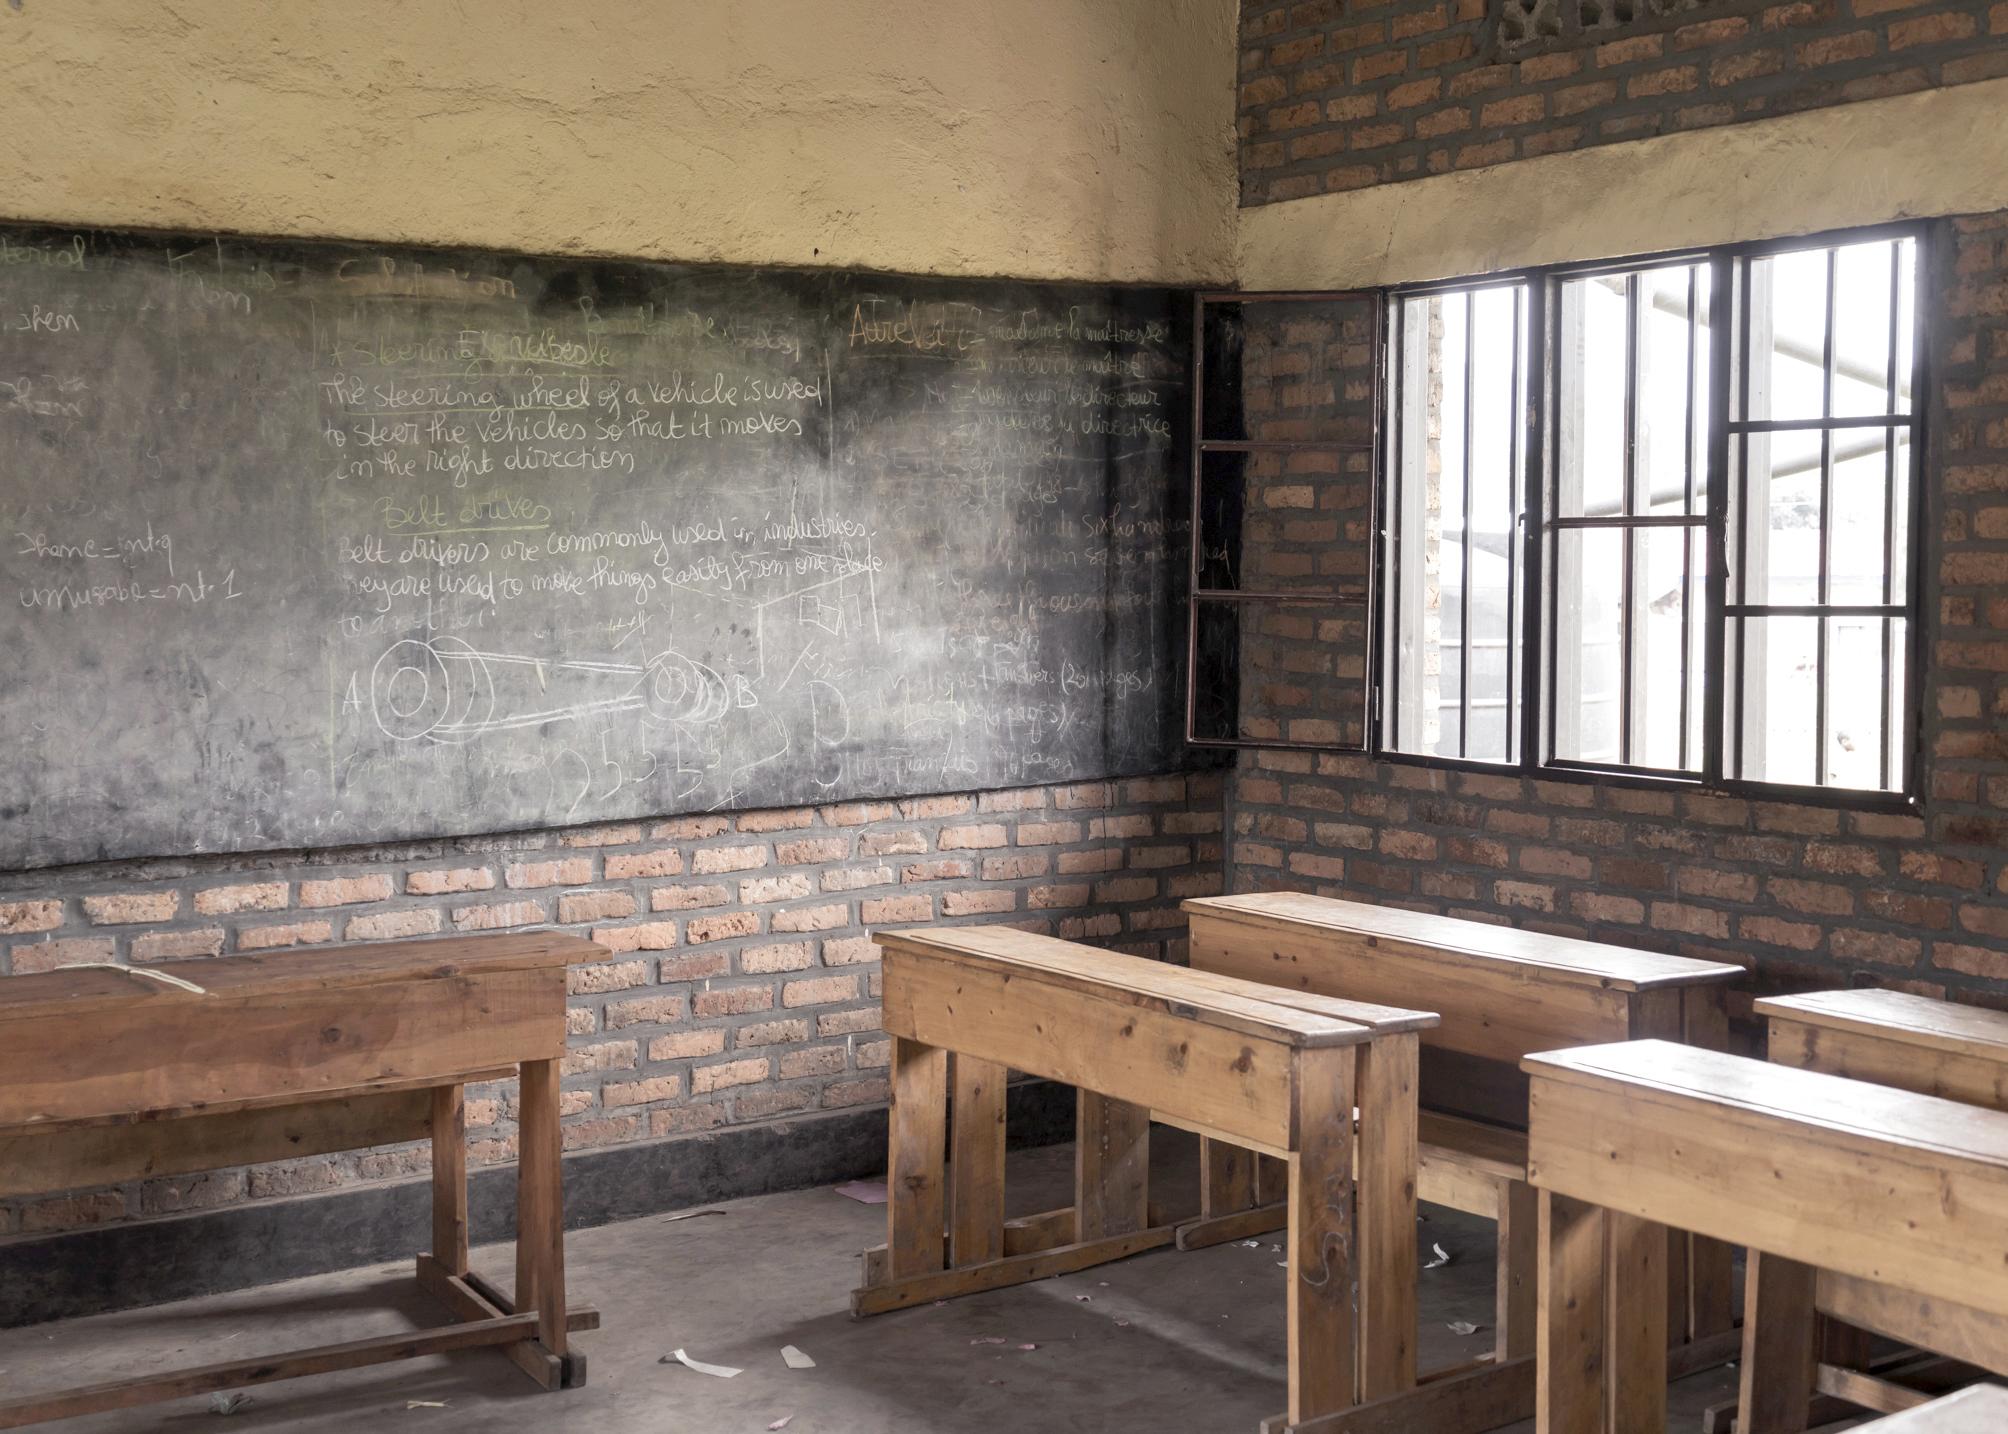 Kabaya School, Ruhengeri